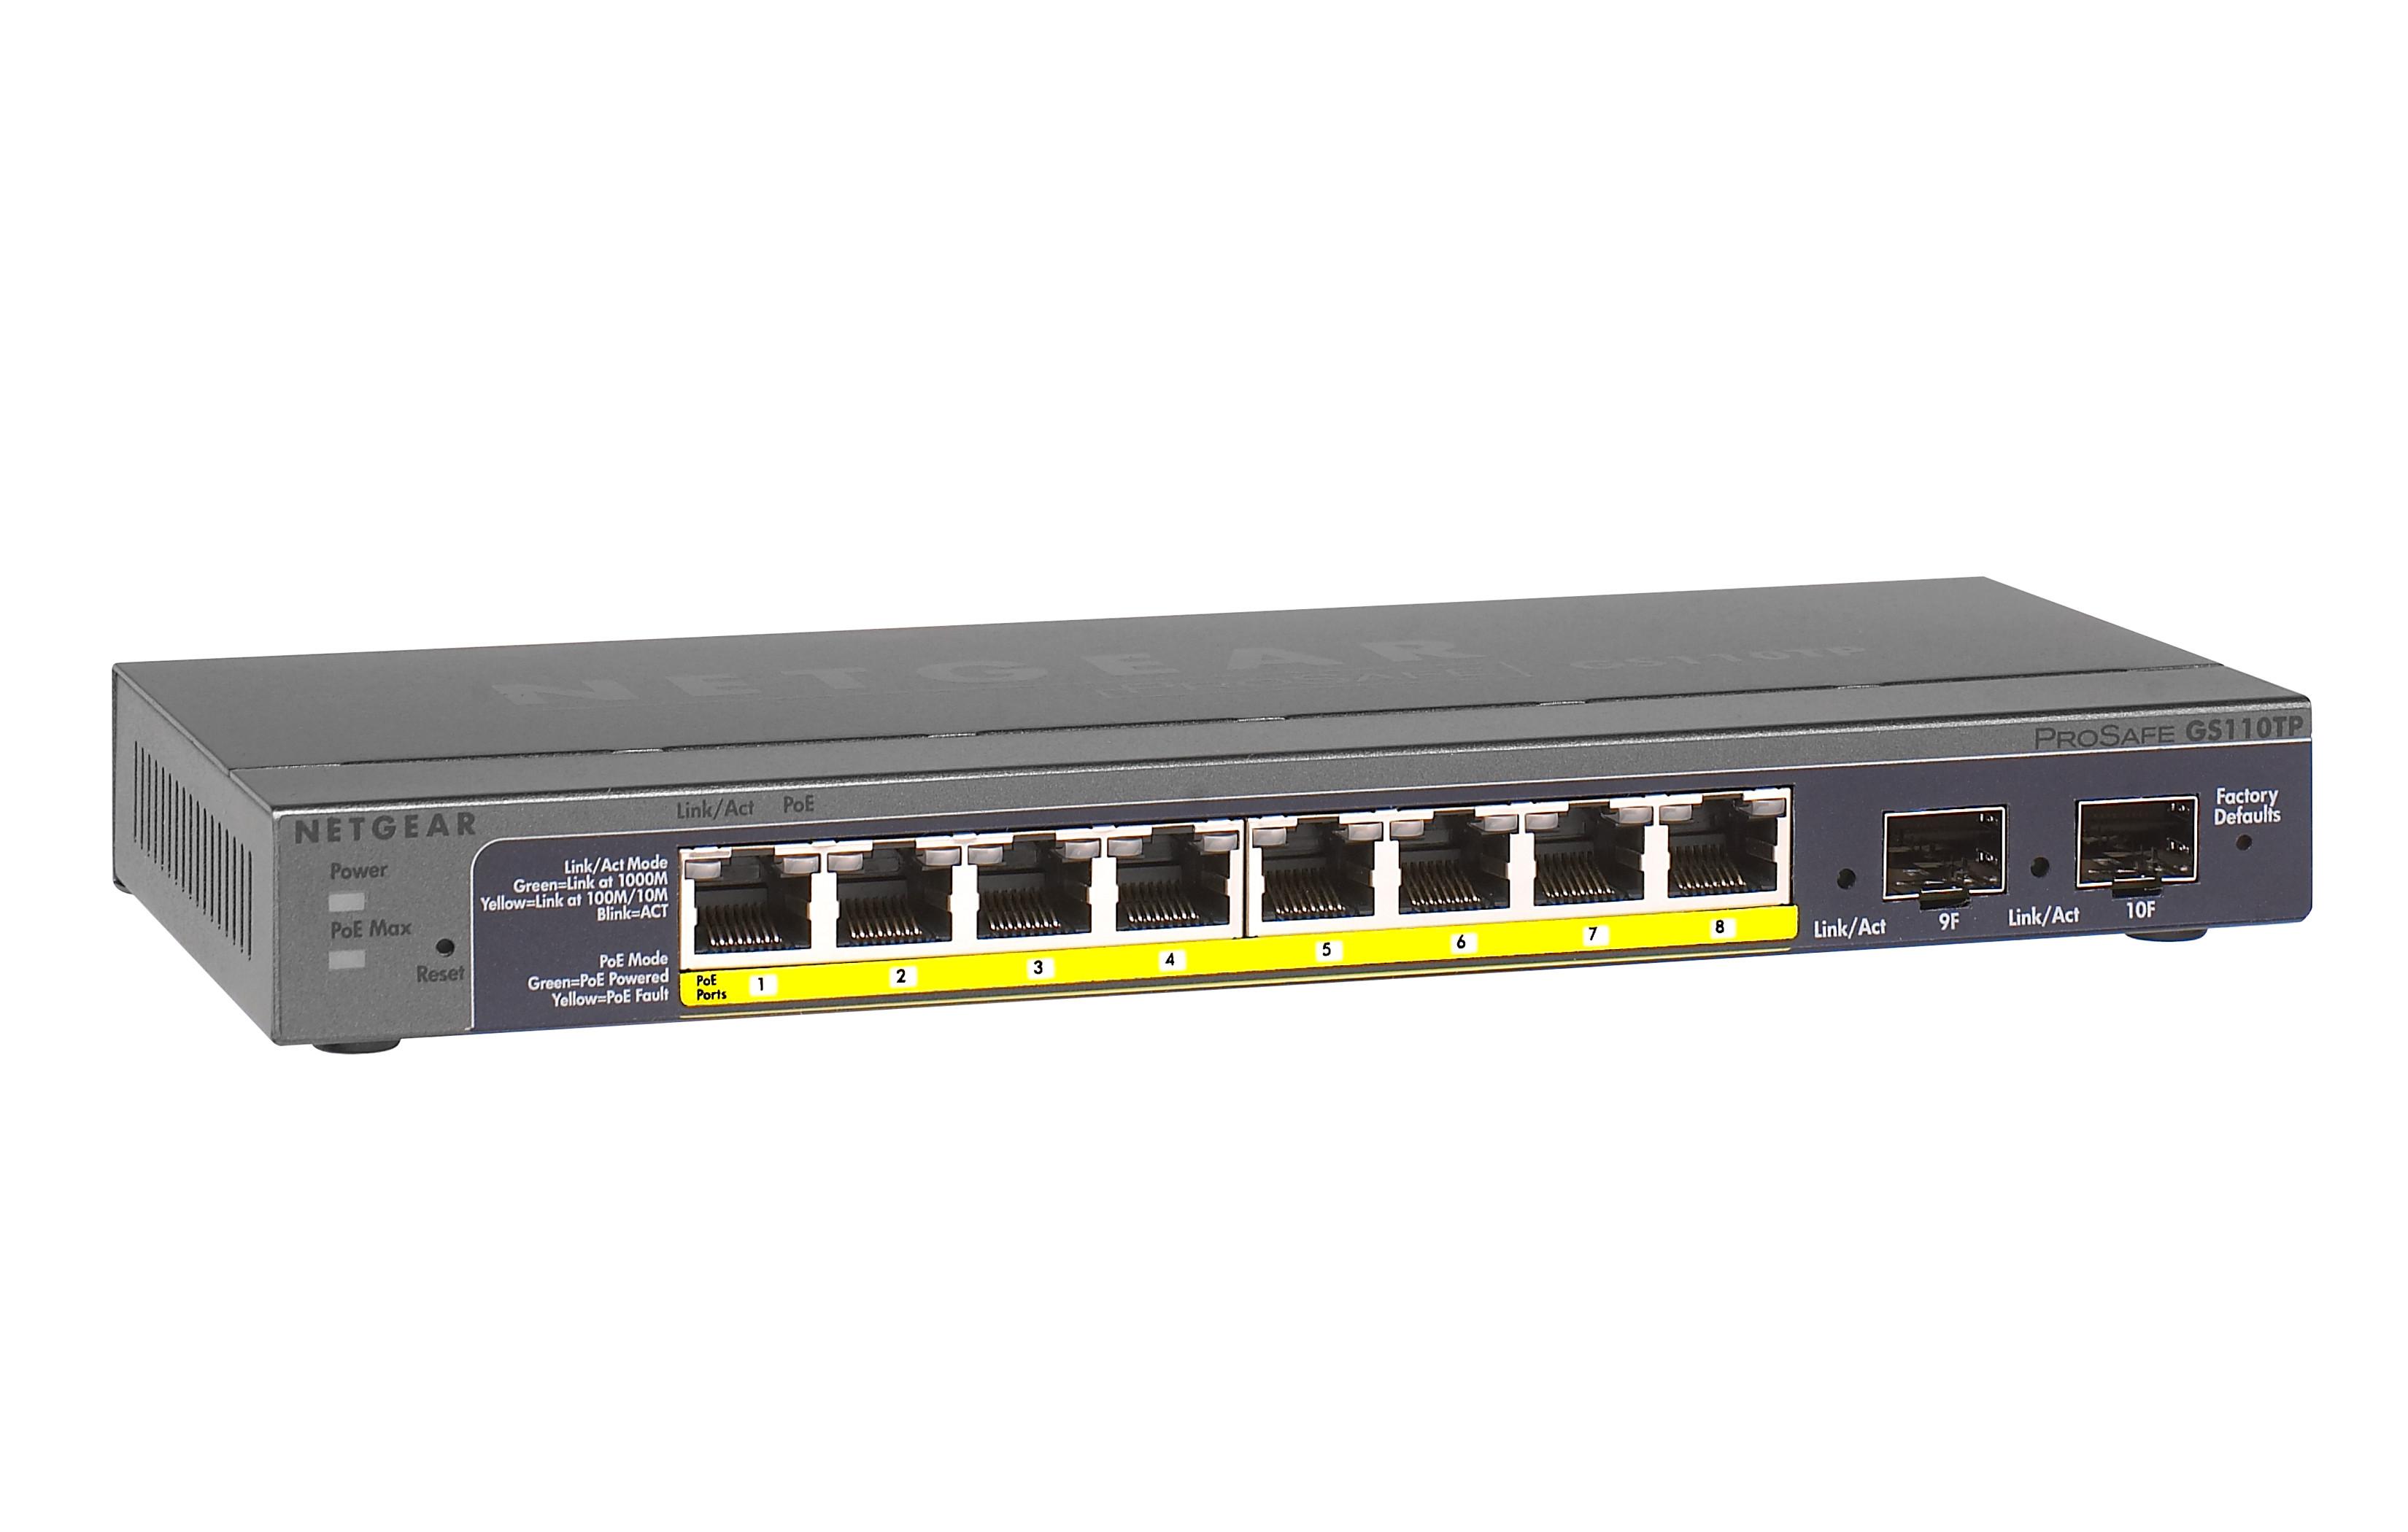 Netgear Prosafe Gs110tp Provu Communications